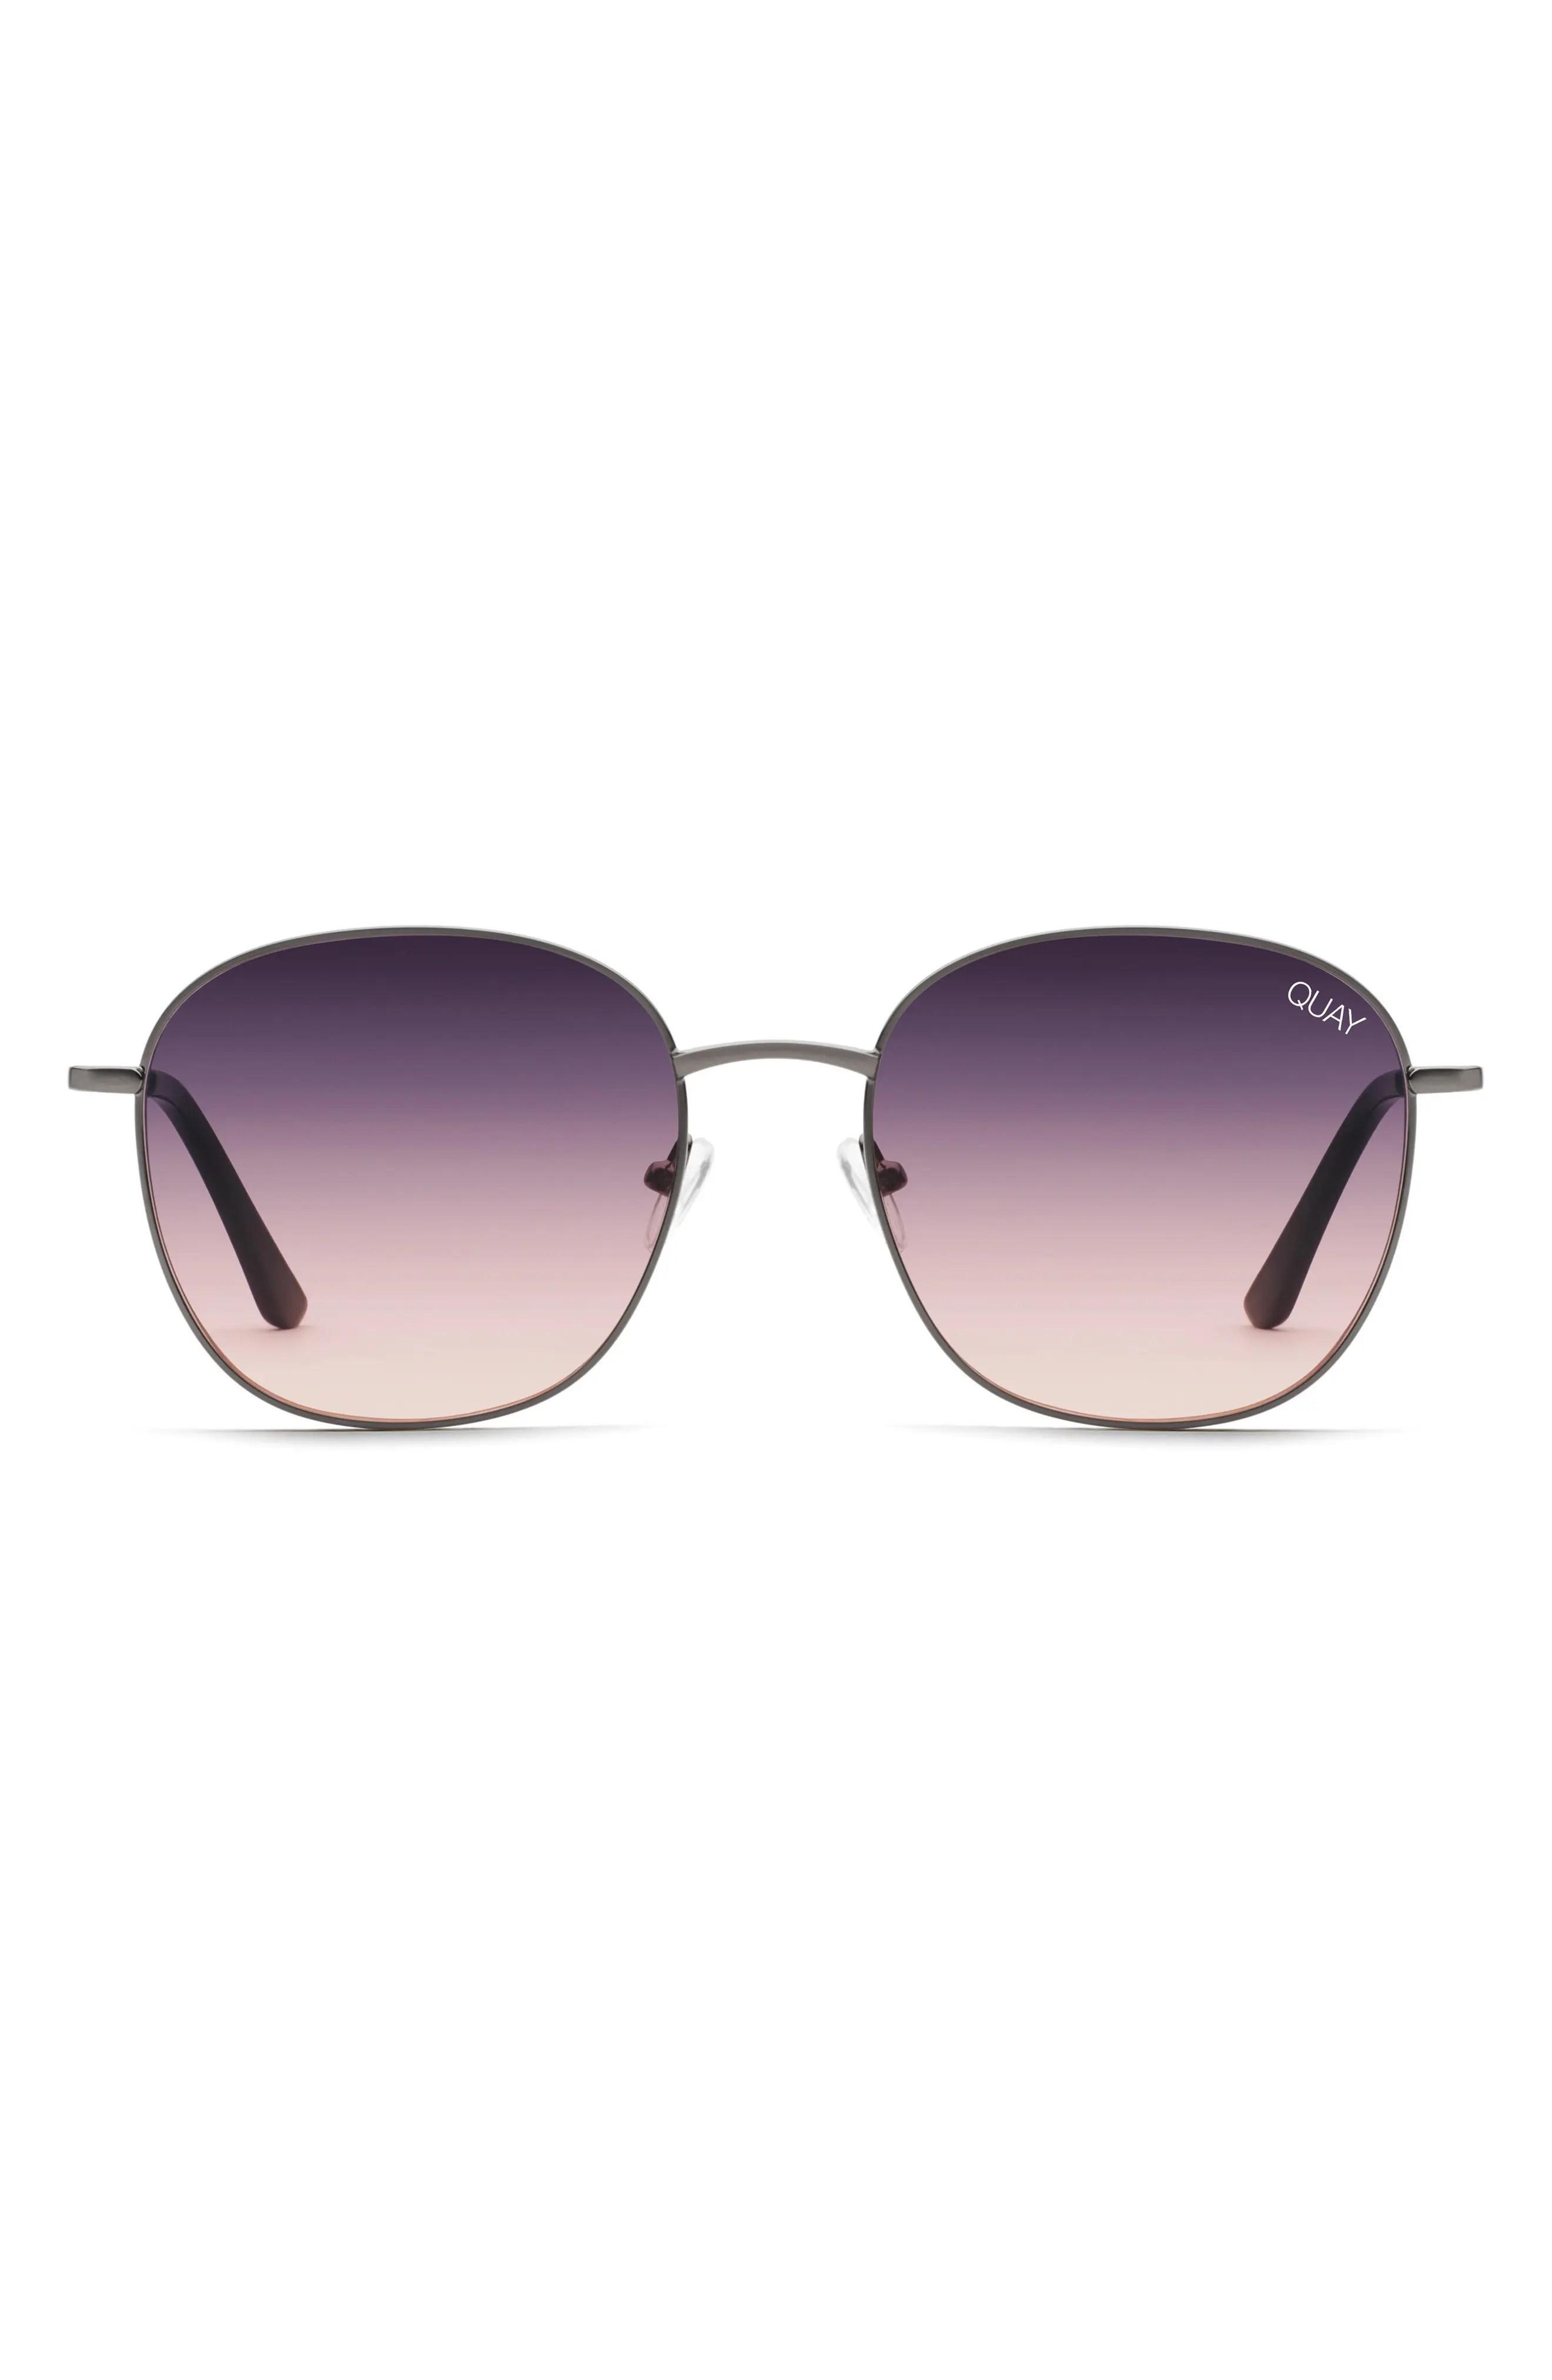 QUAY AUSTRALIA Jezabell 57mm Round Sunglasses, Main, color, GUN/ NAVY PEACH